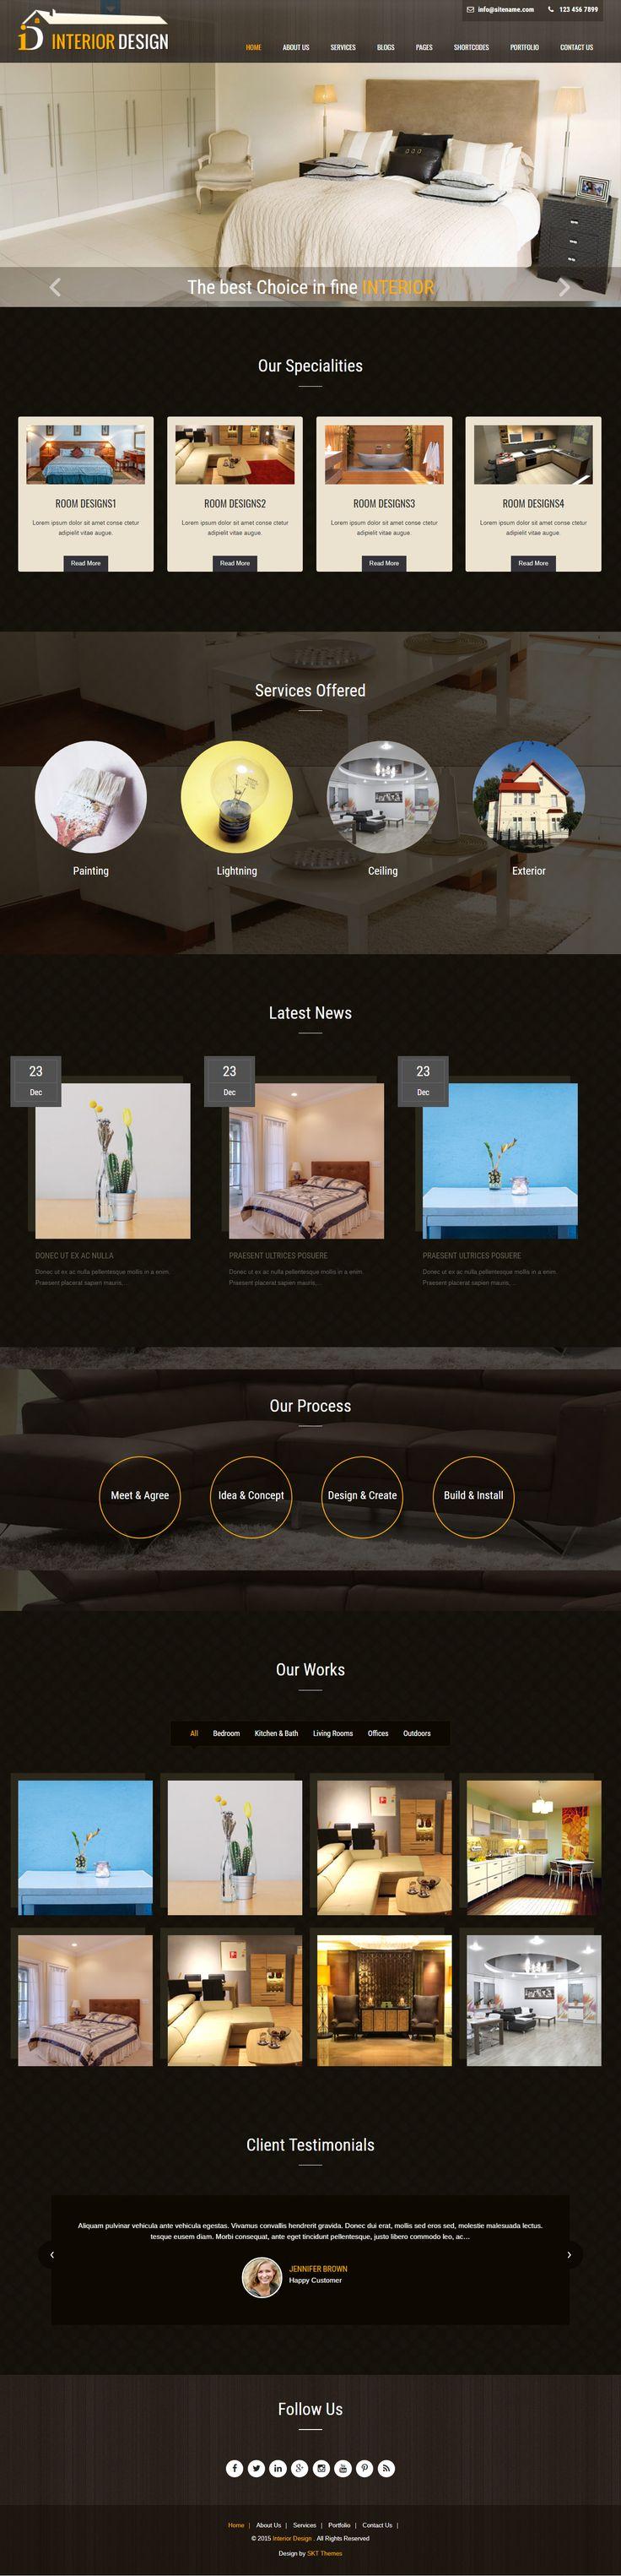 Free Interior Design WordPress Theme for Interior Architecture Websites